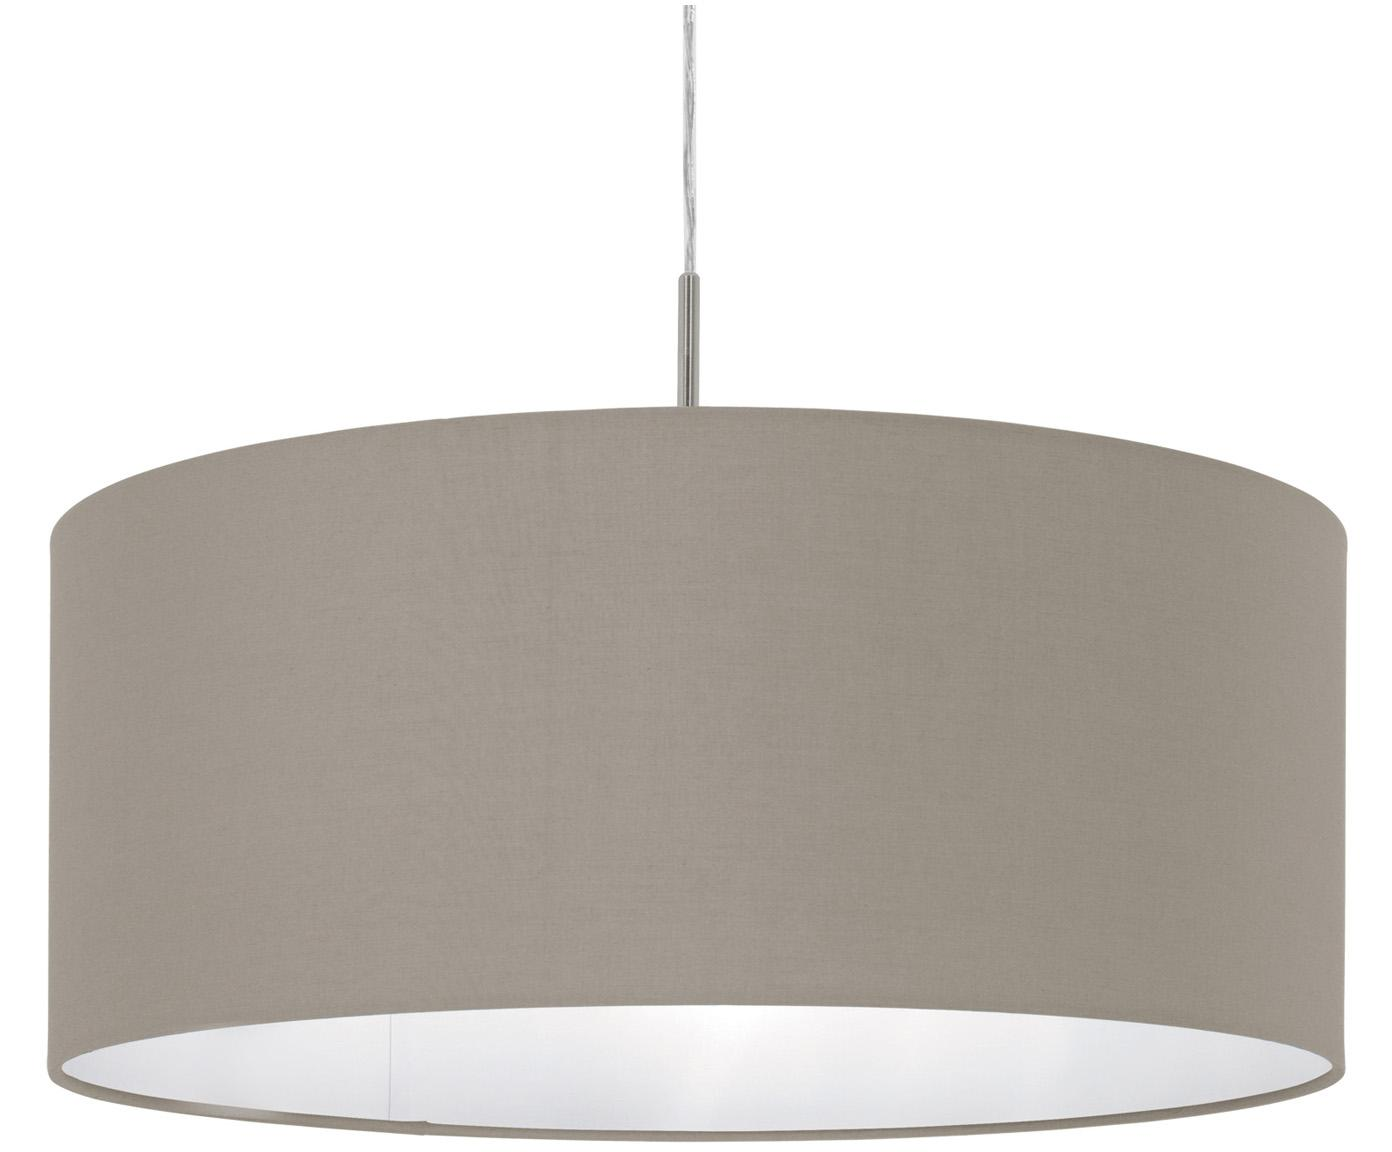 Pendelleuchte Parry, Baldachin: Metall, vernickelt, Lampenschirm: Textil, Silberfarben,Taupe, ∅ 53 x H 25 cm